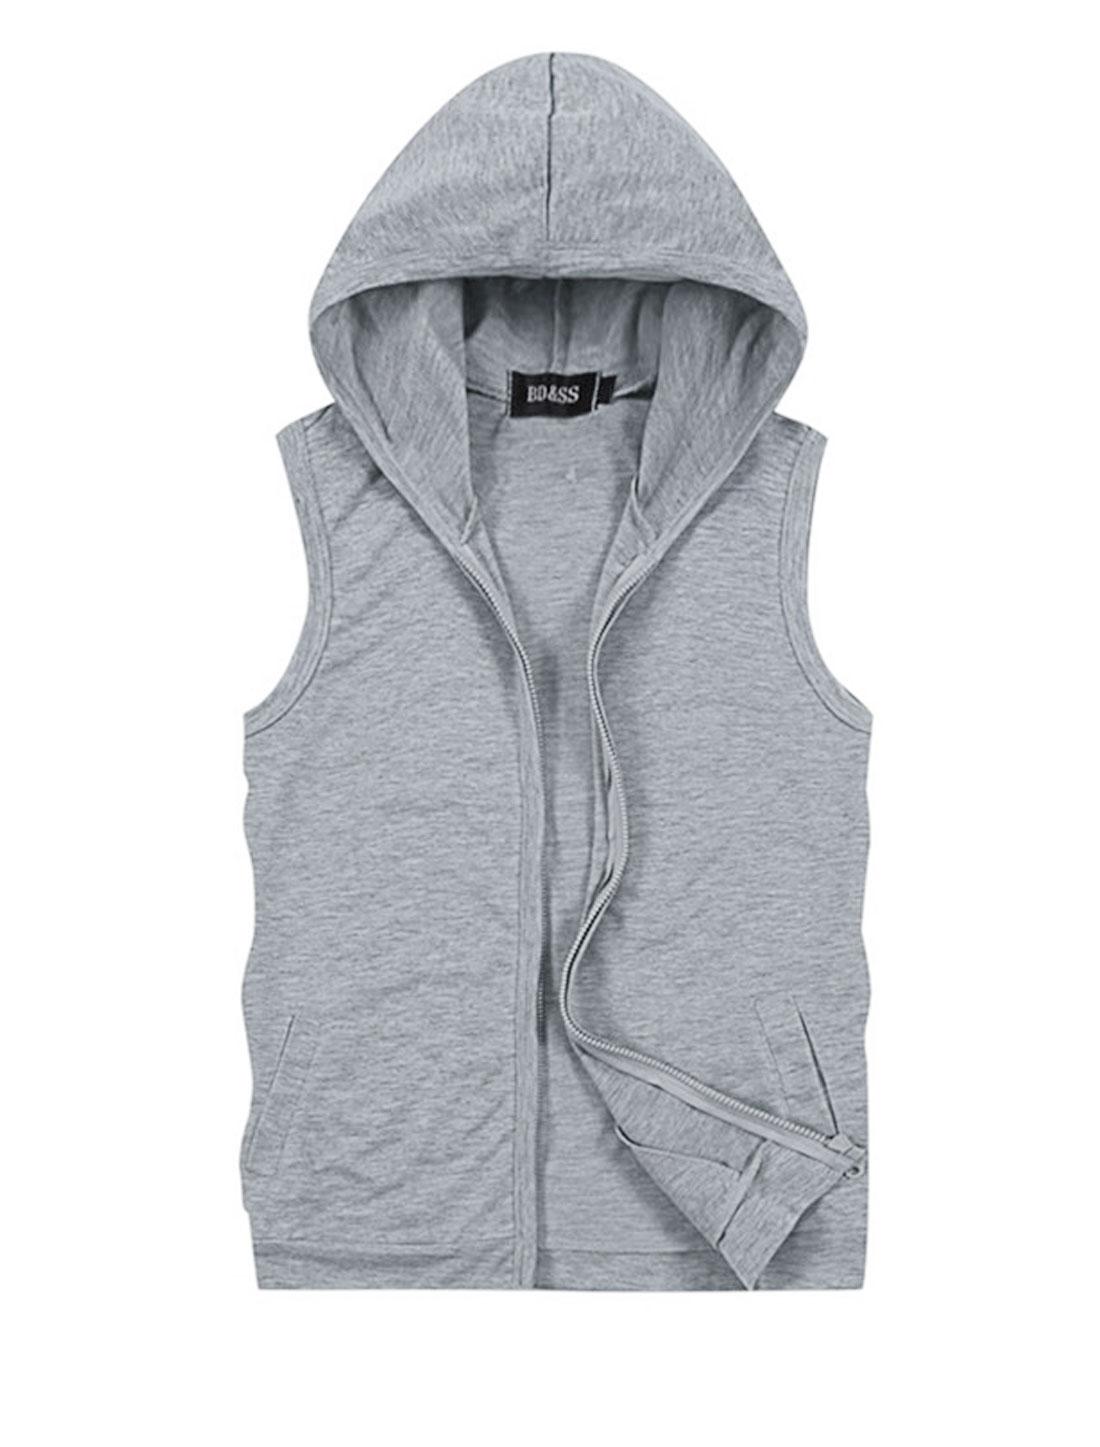 Men Hooded Zipper Closure Sleeveless Casual Vest Light Gray M